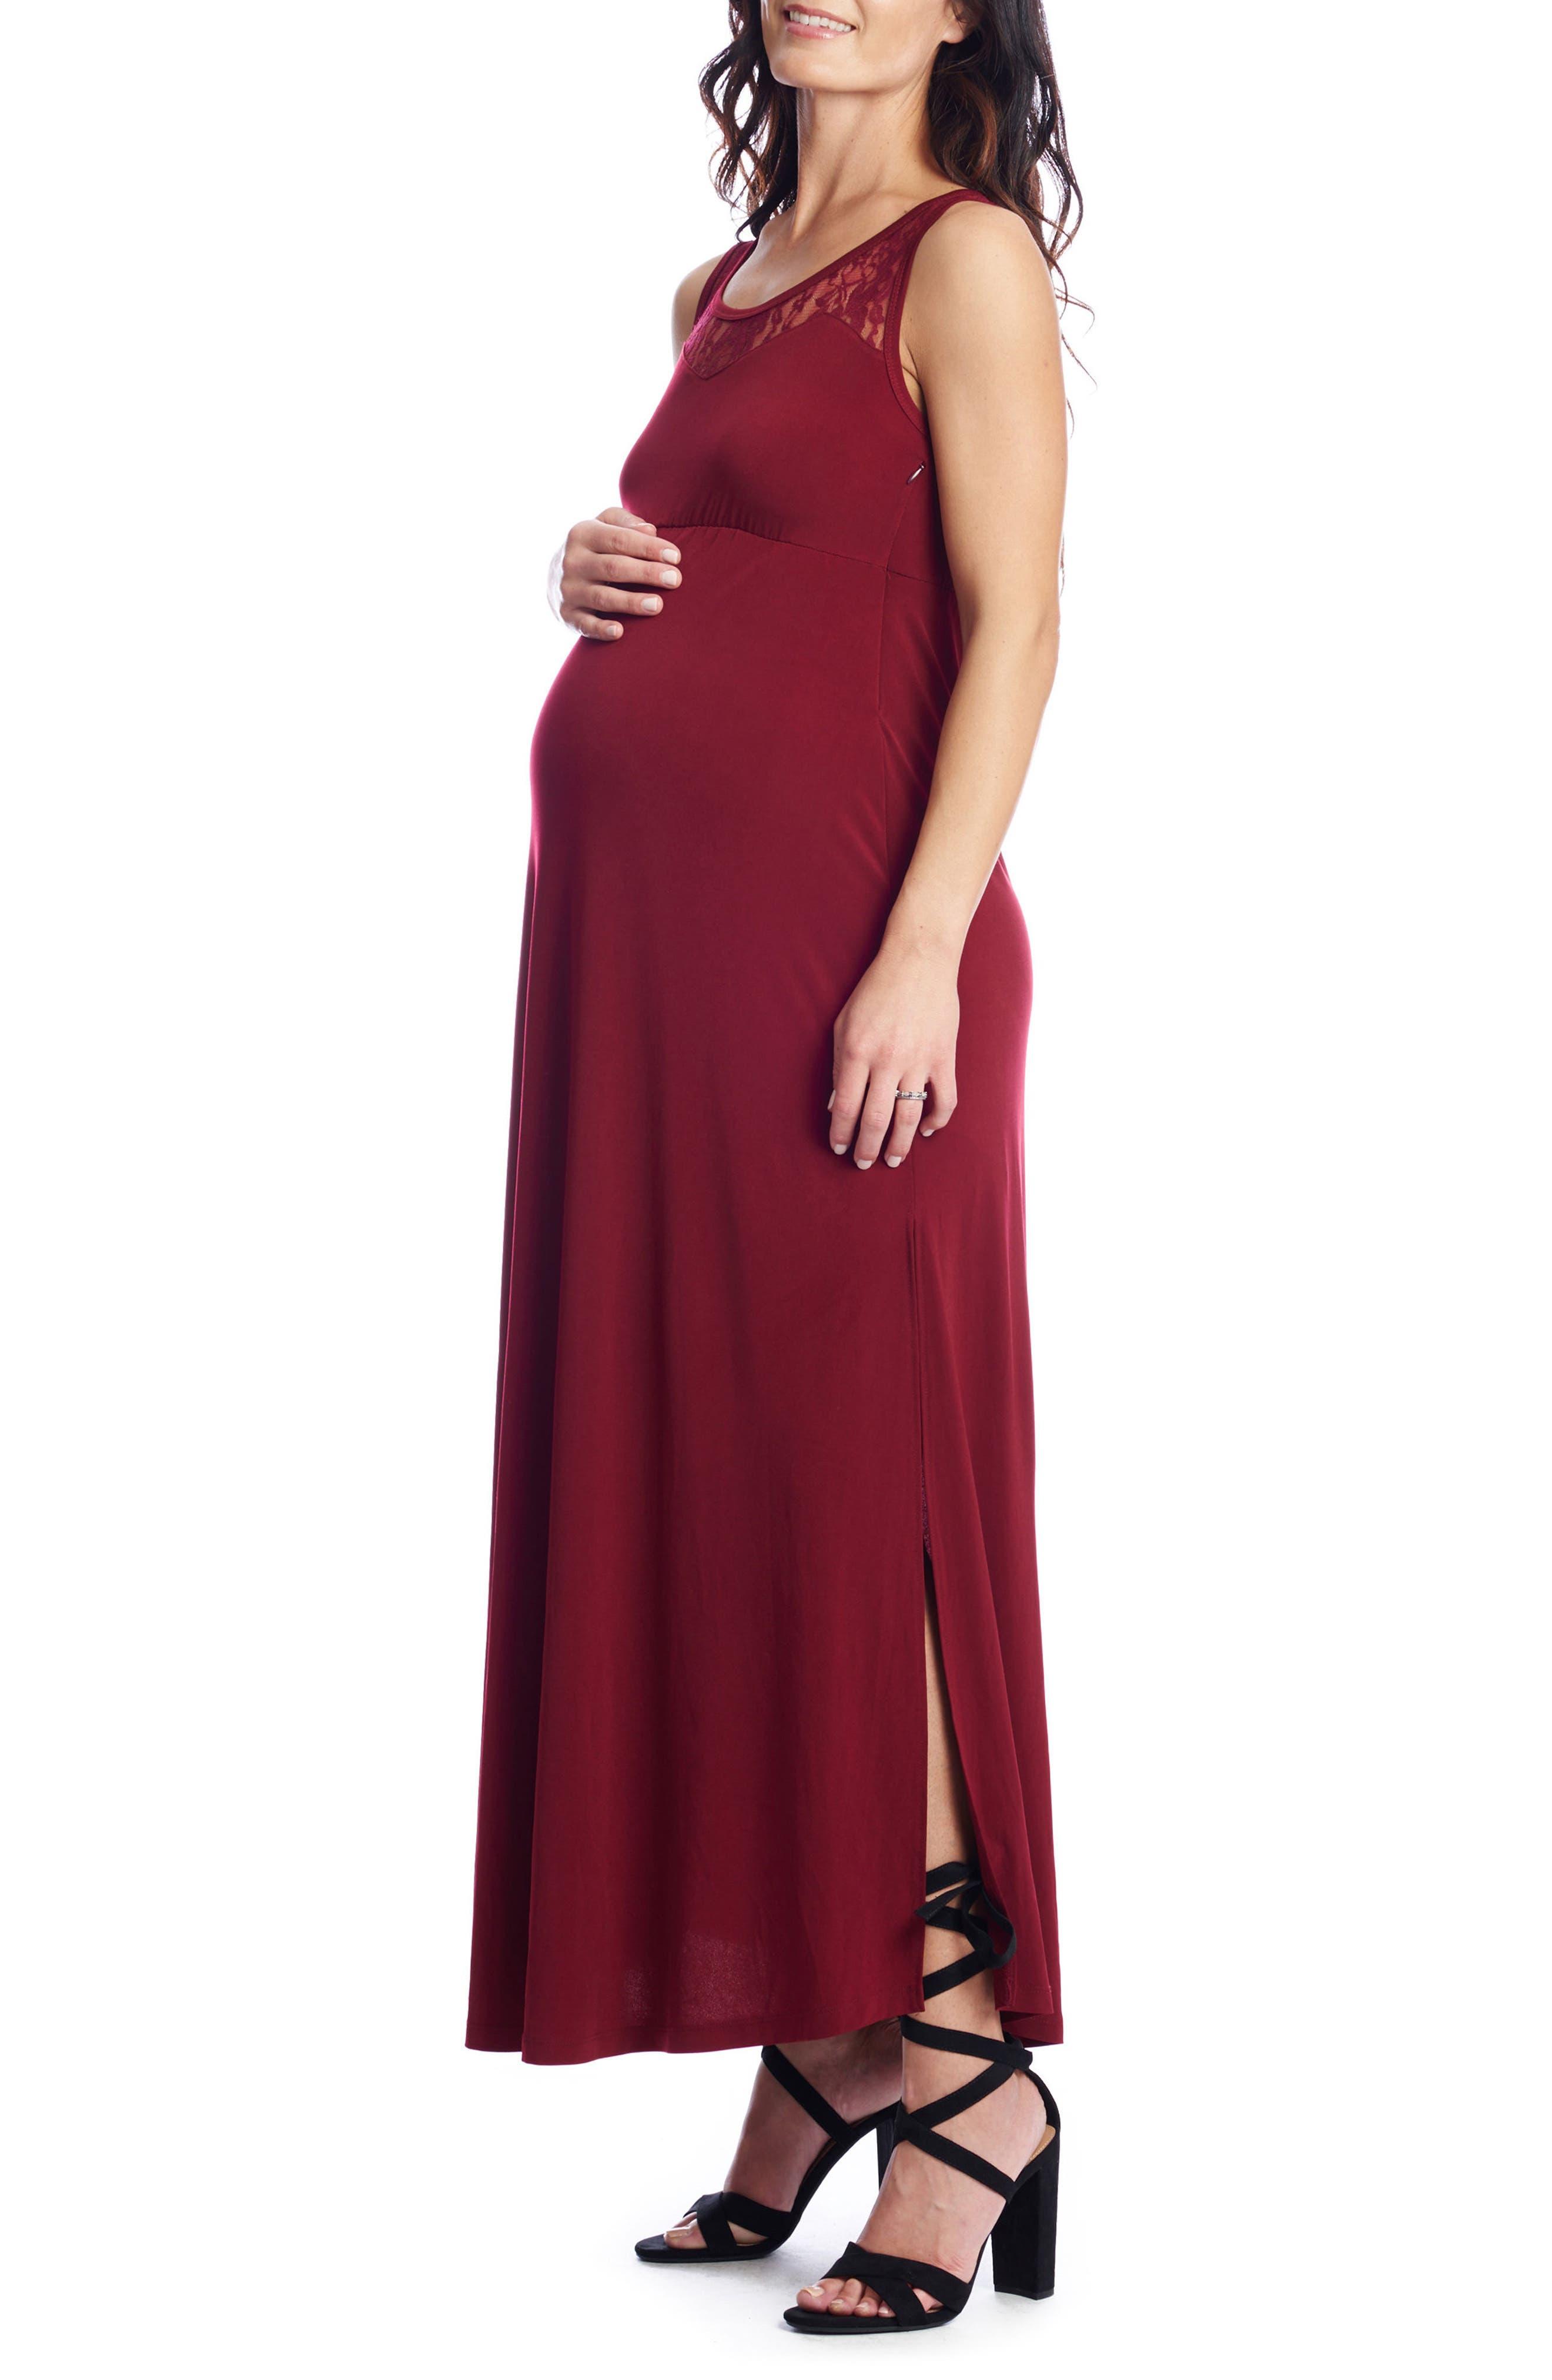 Alternate Image 1 Selected - Everly Grey Rose Maternity/Nursing Maxi Dress